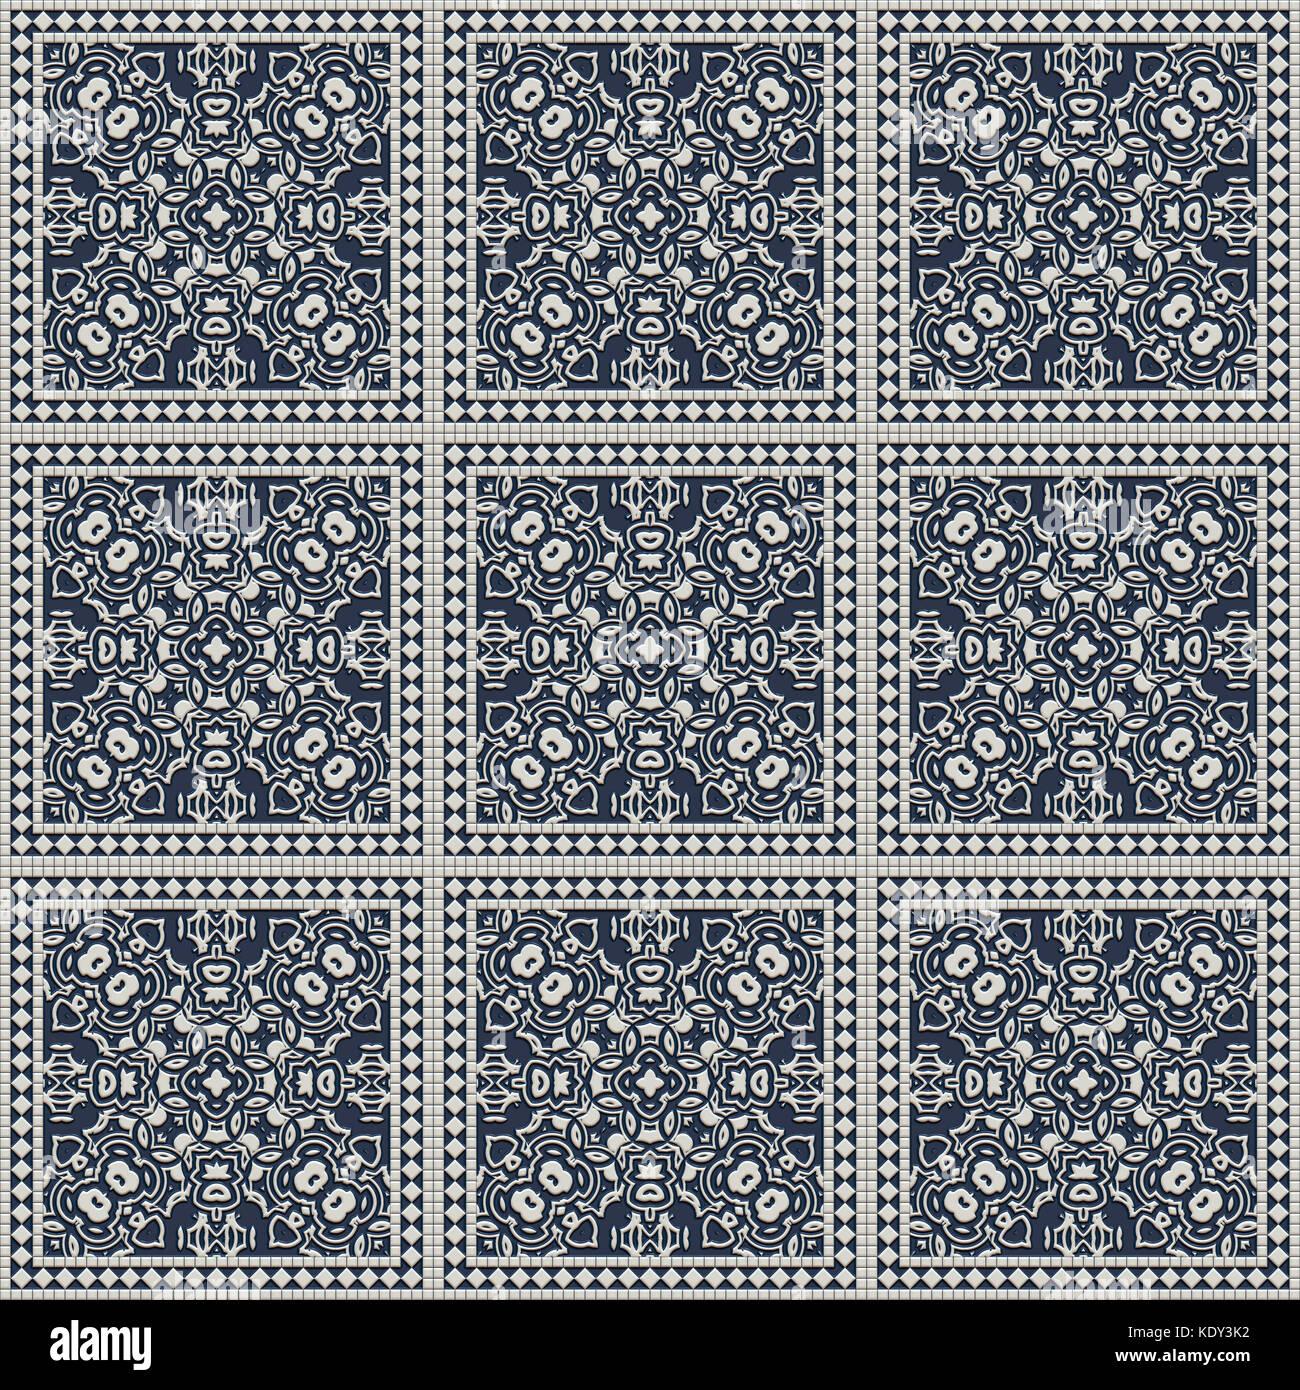 Artistic ceramic stock photos artistic ceramic stock images alamy artistic ceramic tiles for interior decor stock image dailygadgetfo Gallery